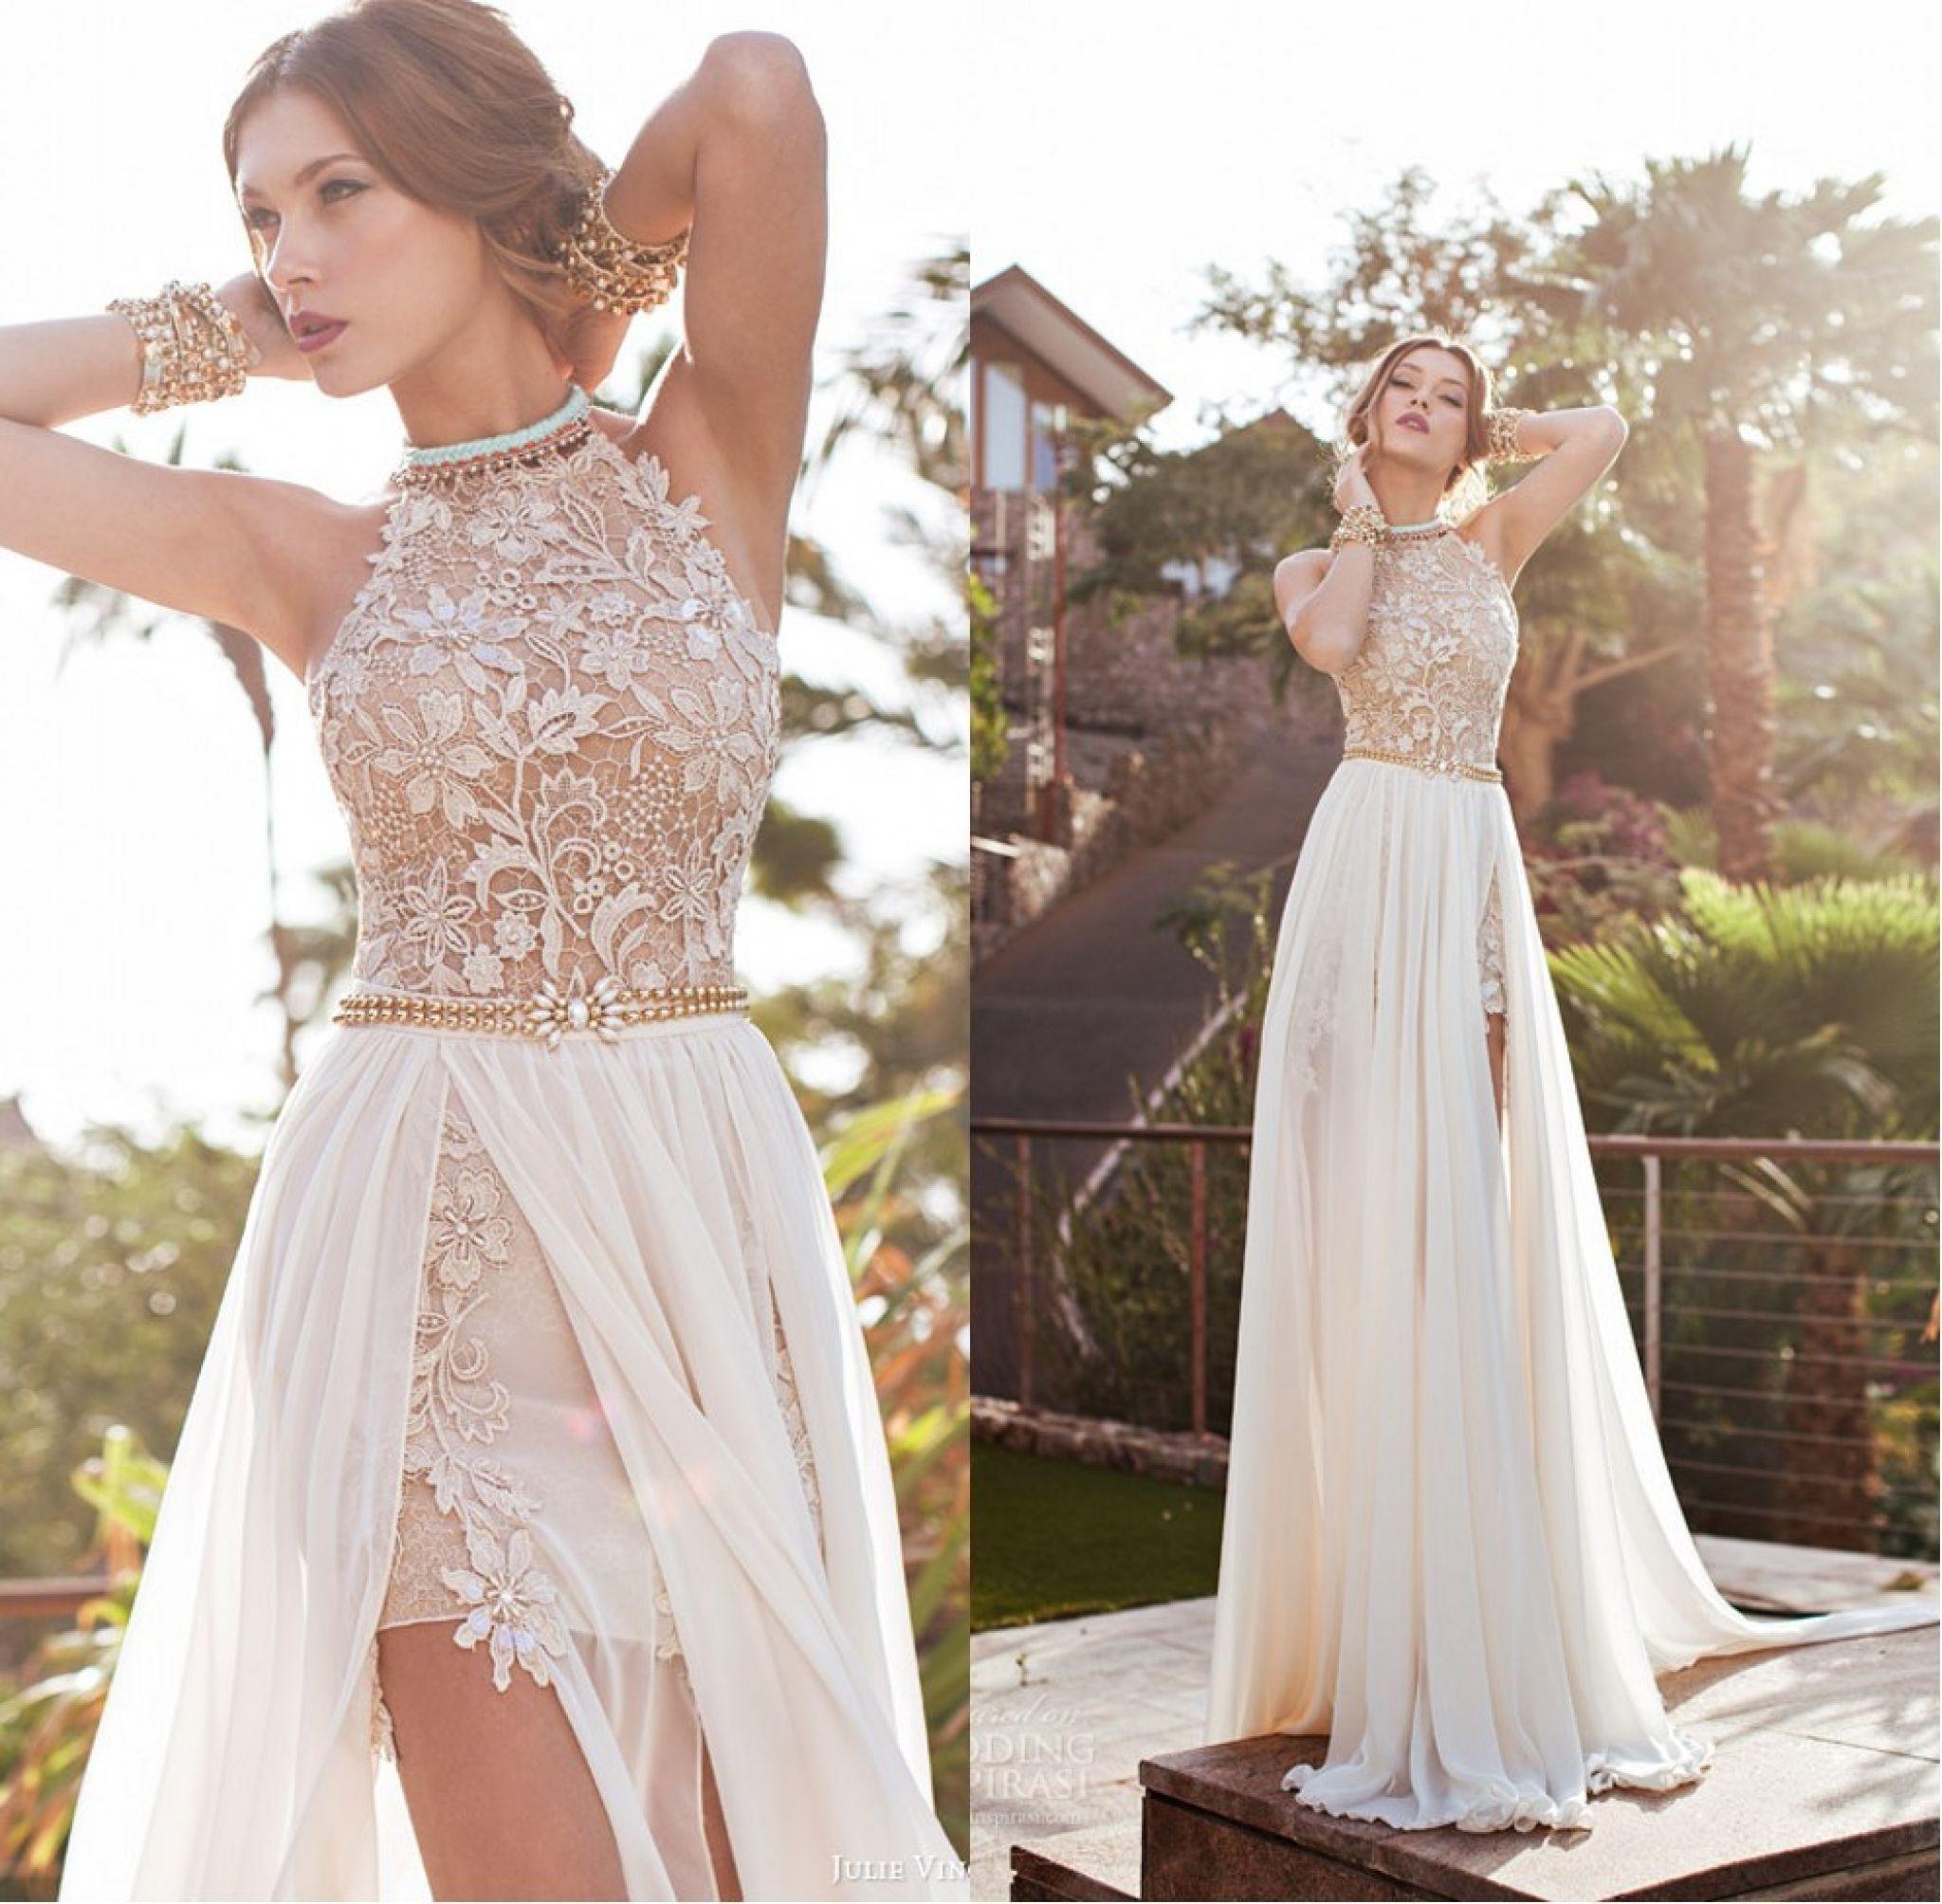 Cheap wedding dresses plus size  cheap cute wedding dresses  plus size dresses for wedding guests